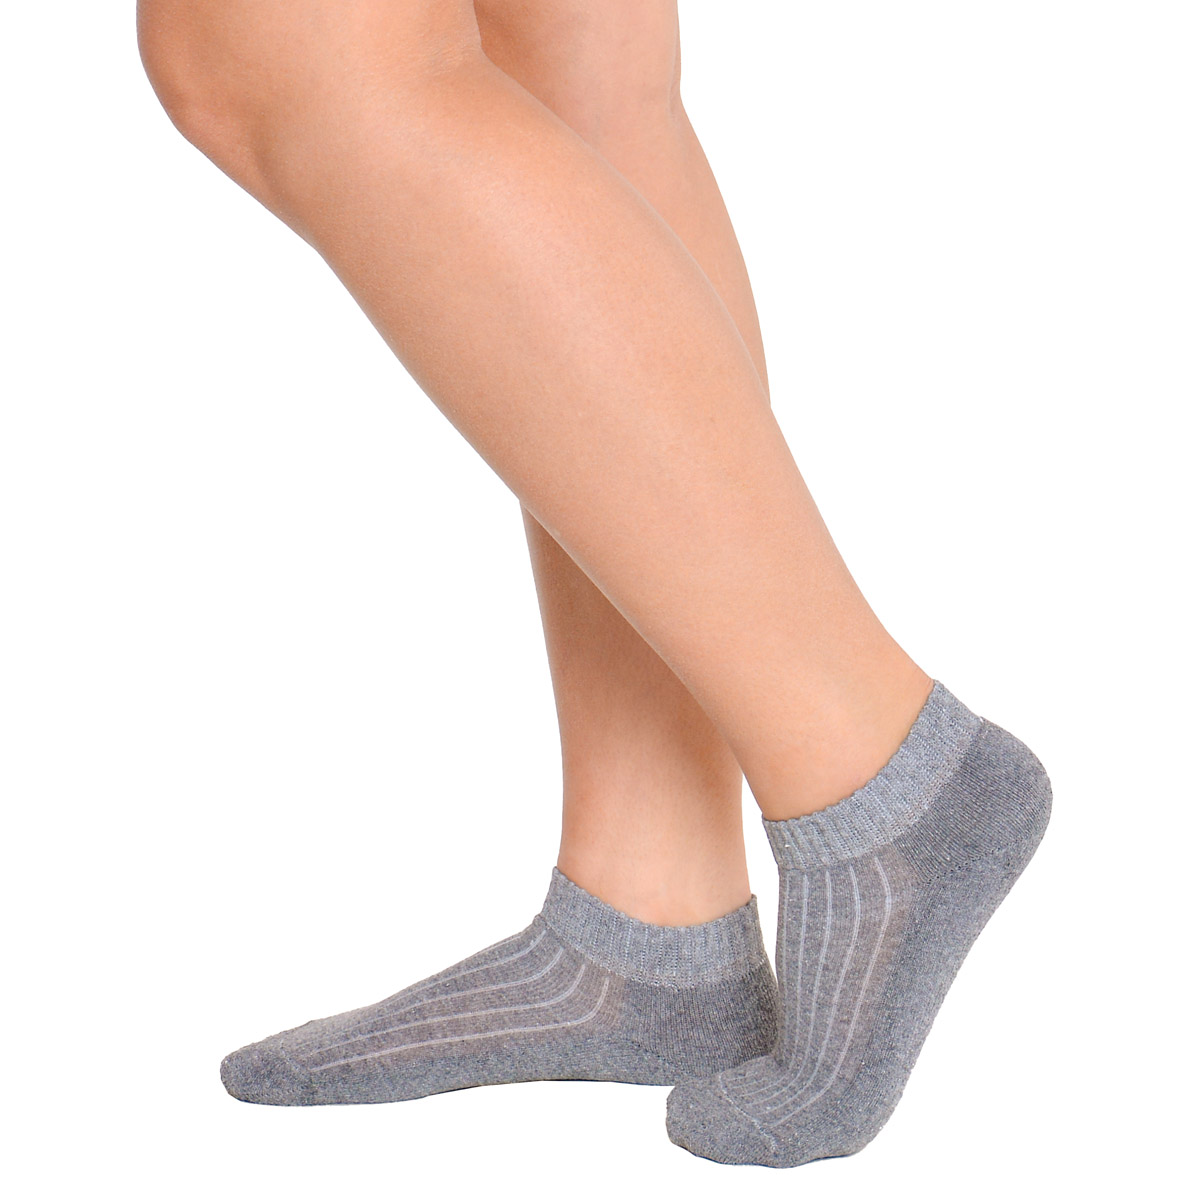 KIT com 3 meias modelo cano curto atoalhada feminina Trifil